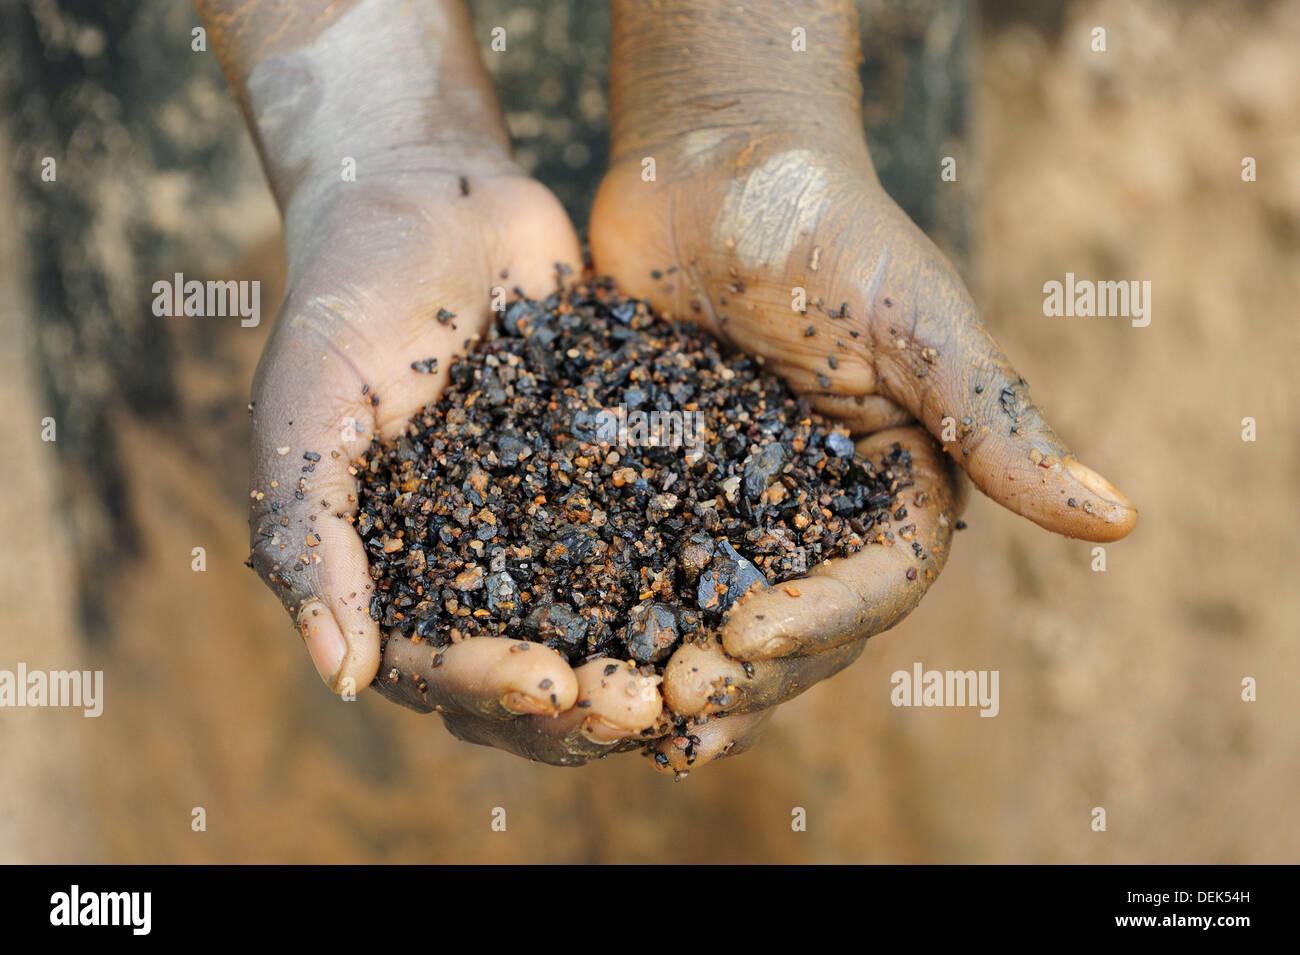 Miner avec les mains pleines de coltan minerai métallique, Muhanga mines de coltan, le Rwanda, l'Afrique Photo Stock